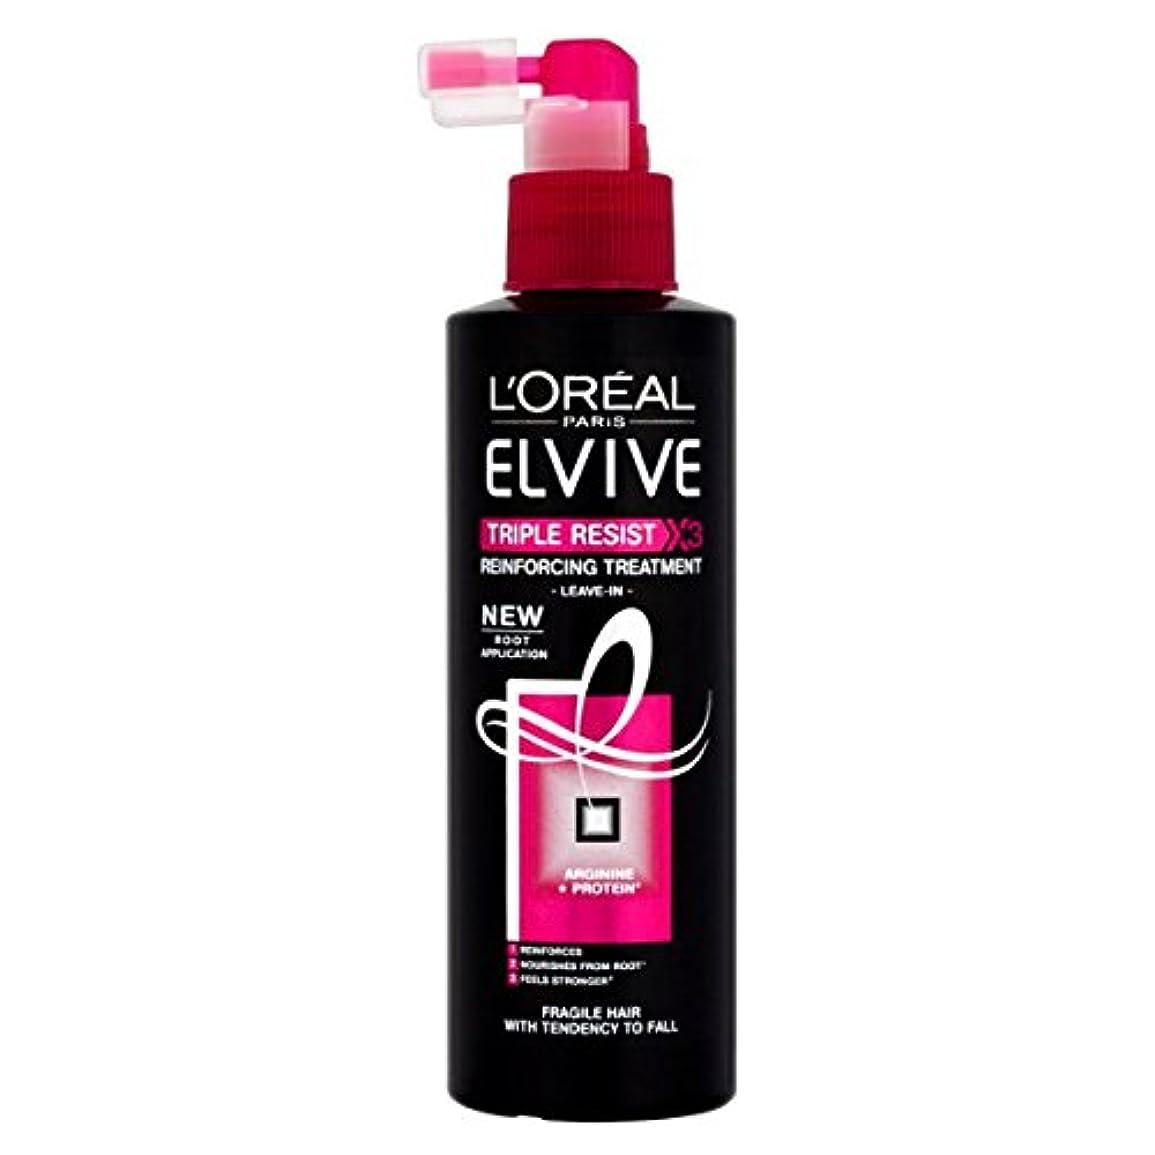 平方同種の海藻L 'Oréal Paris Elvive Triple Resist Leave-In verstärkendem Treatment 200 ml